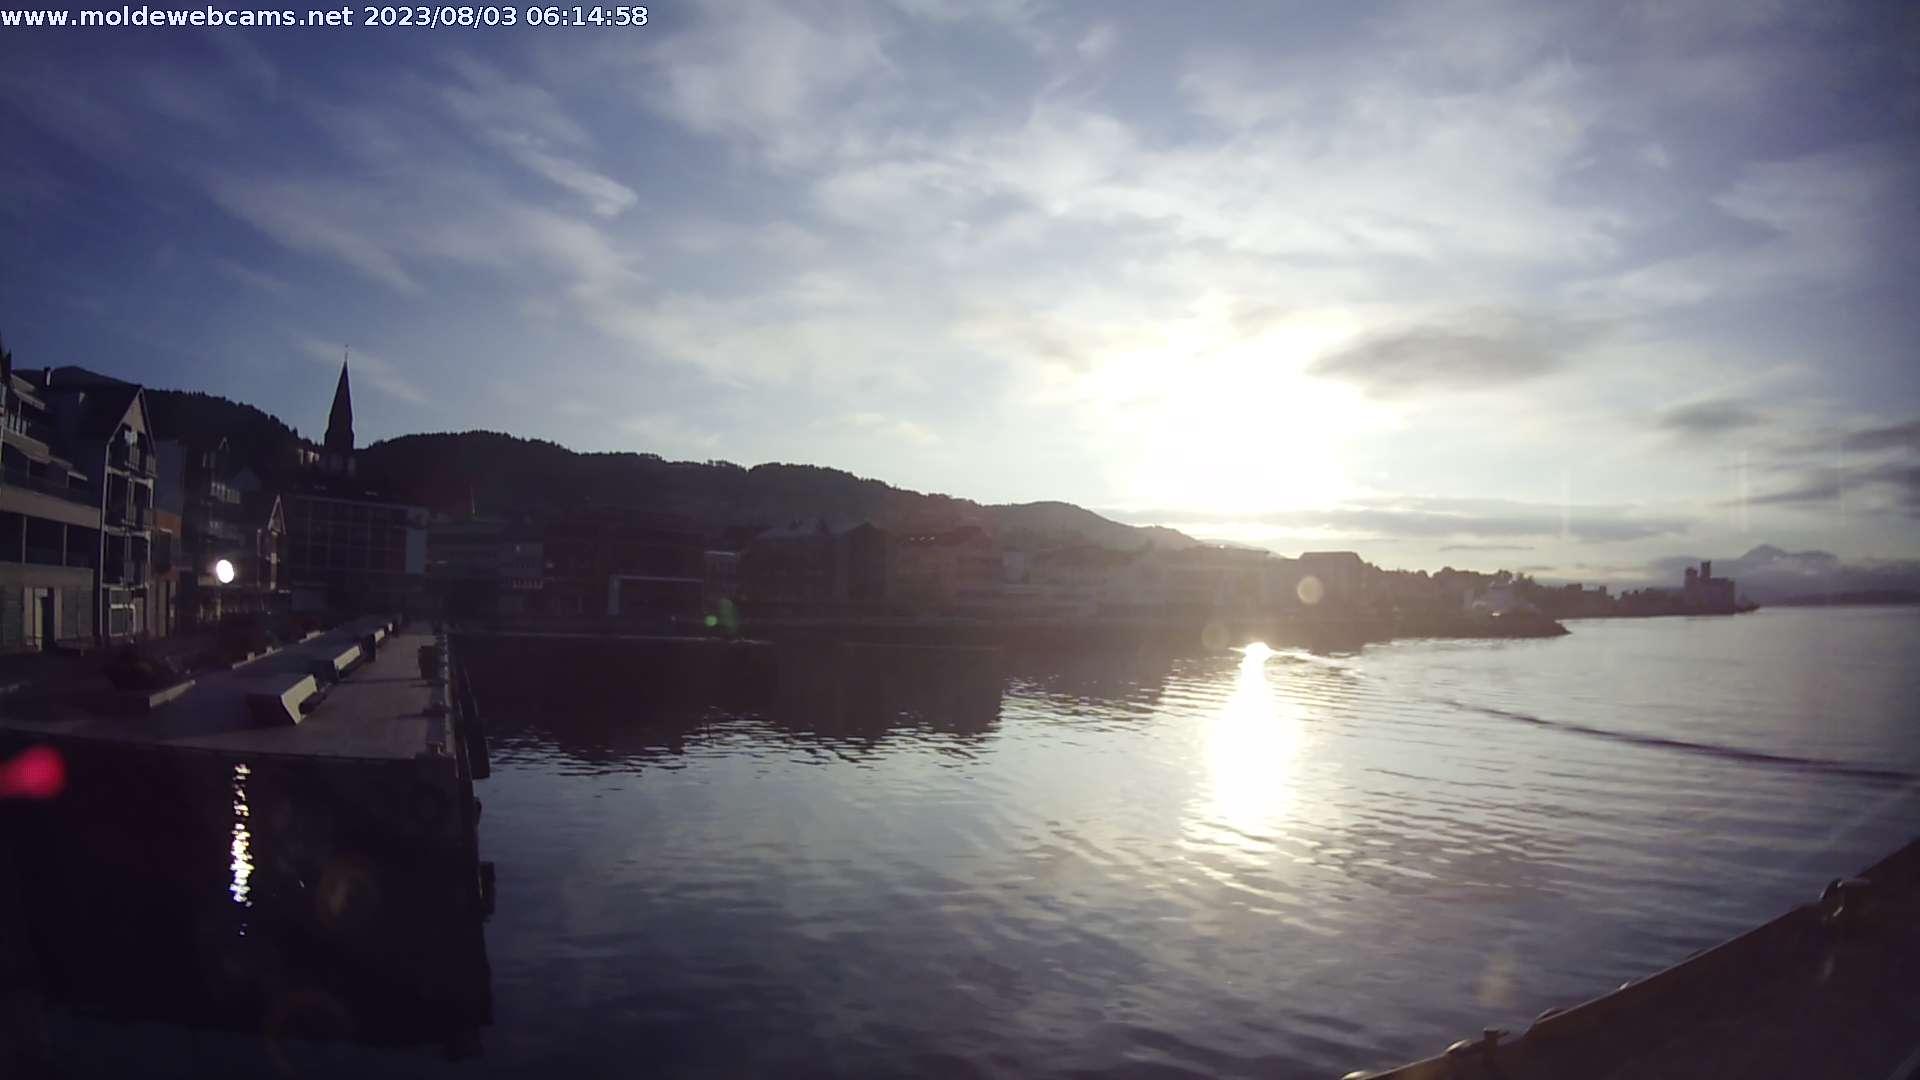 Dettagli webcam Molde